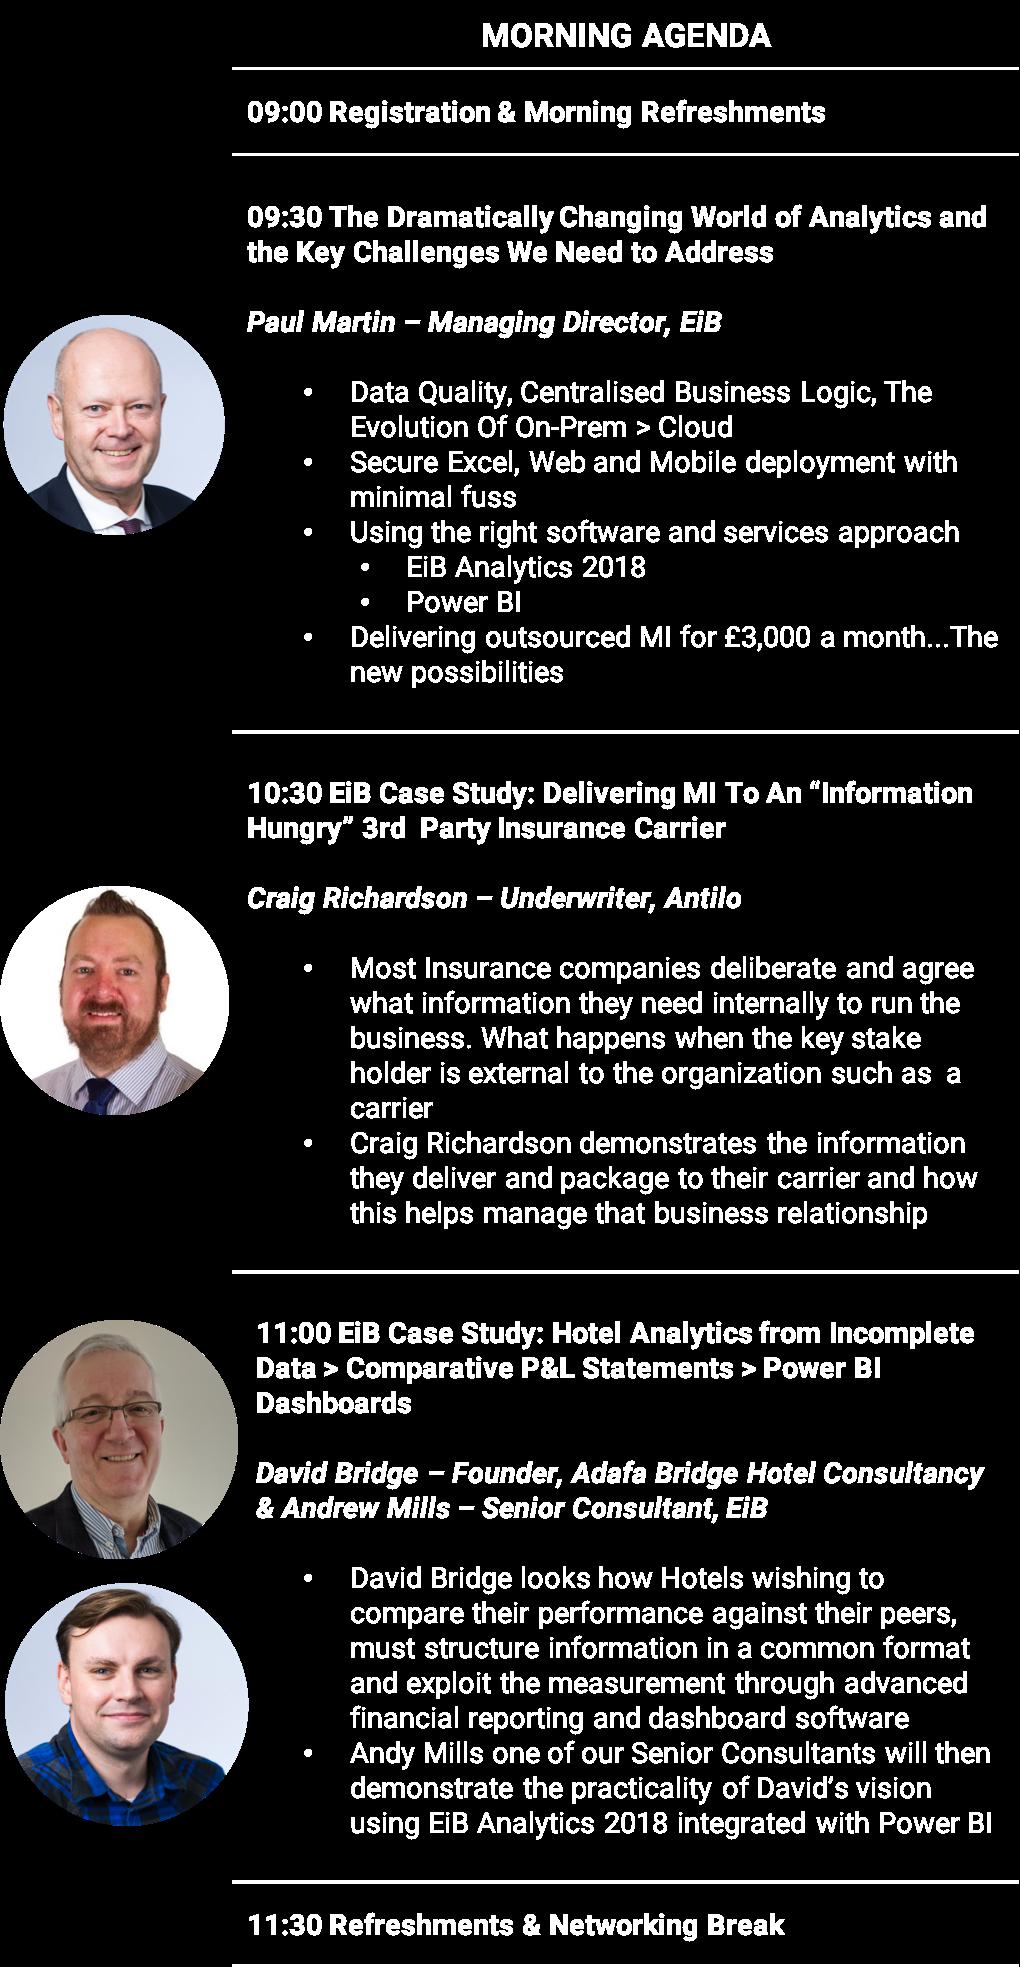 EiB Analytics 2018 Conference - Wednesday 25th April - Morning Agenda